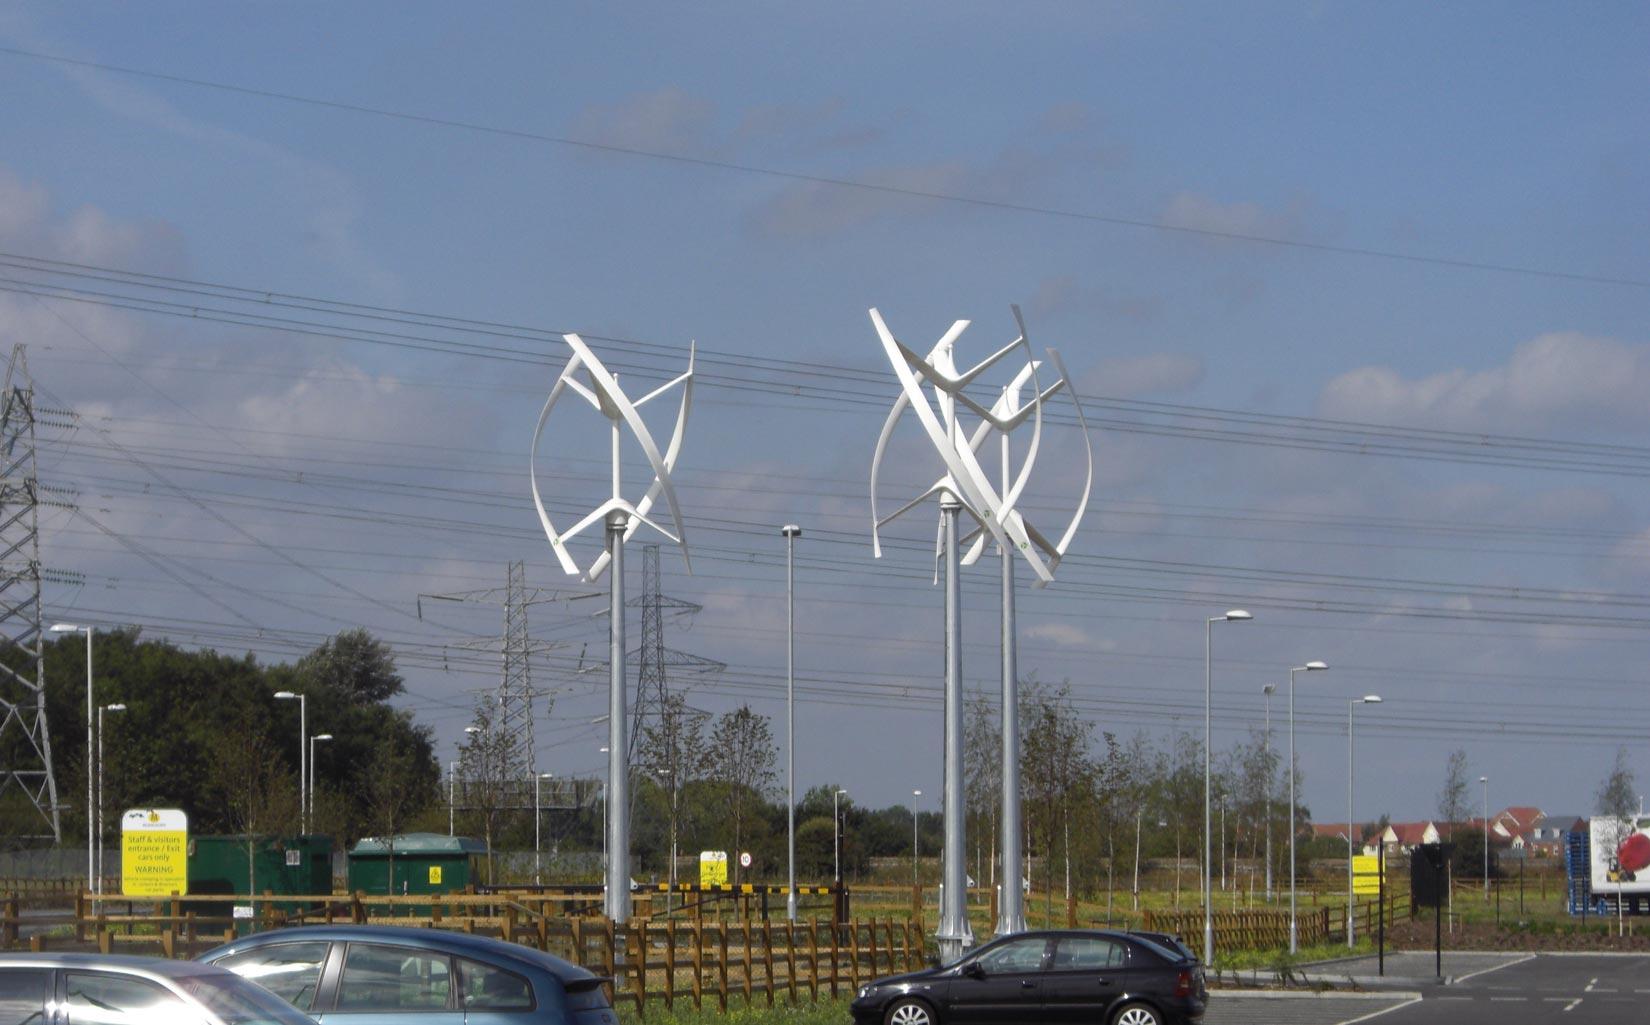 Morrisons Sittingbourne Distribution Centre, Environmental